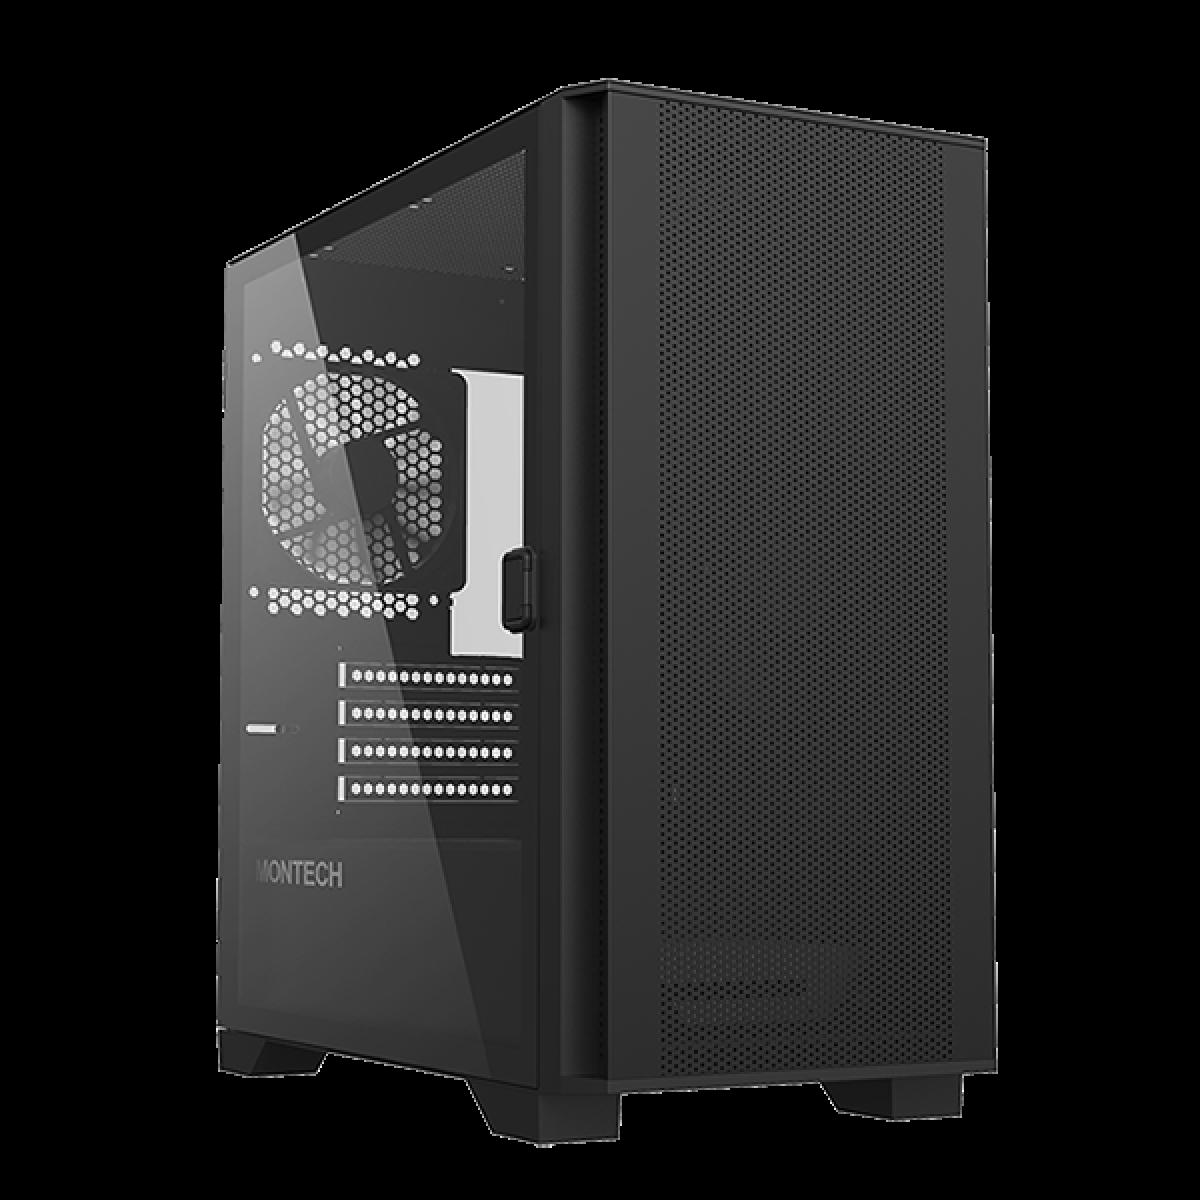 Gabinete Gamer Montech AIR 100 Lite, Mini Tower, Black, Micro ATX, 2 Fans, Vidro Temperado